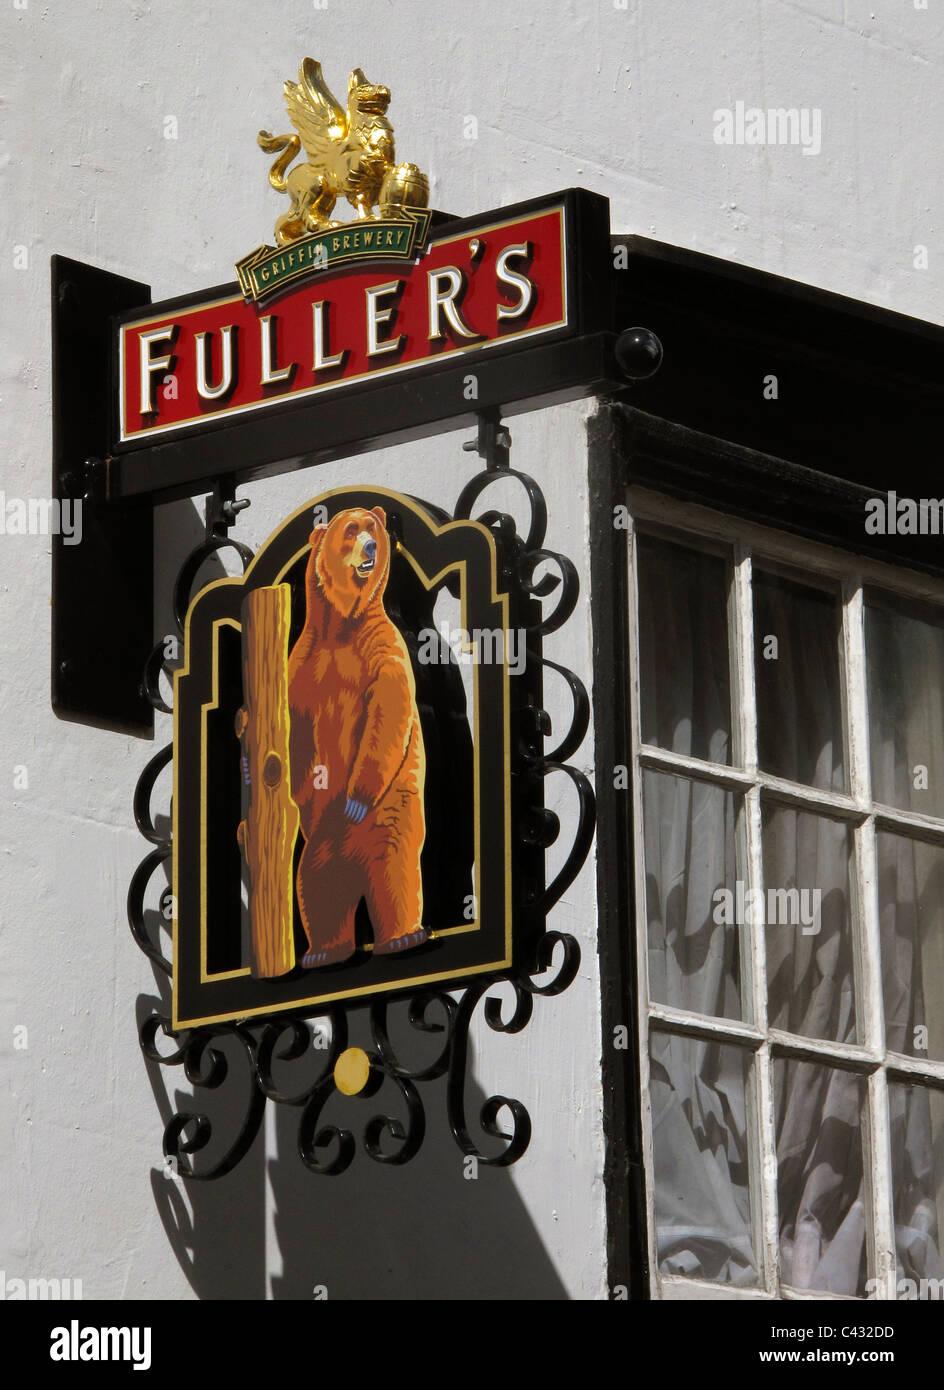 Fuller's pub sign - Stock Image